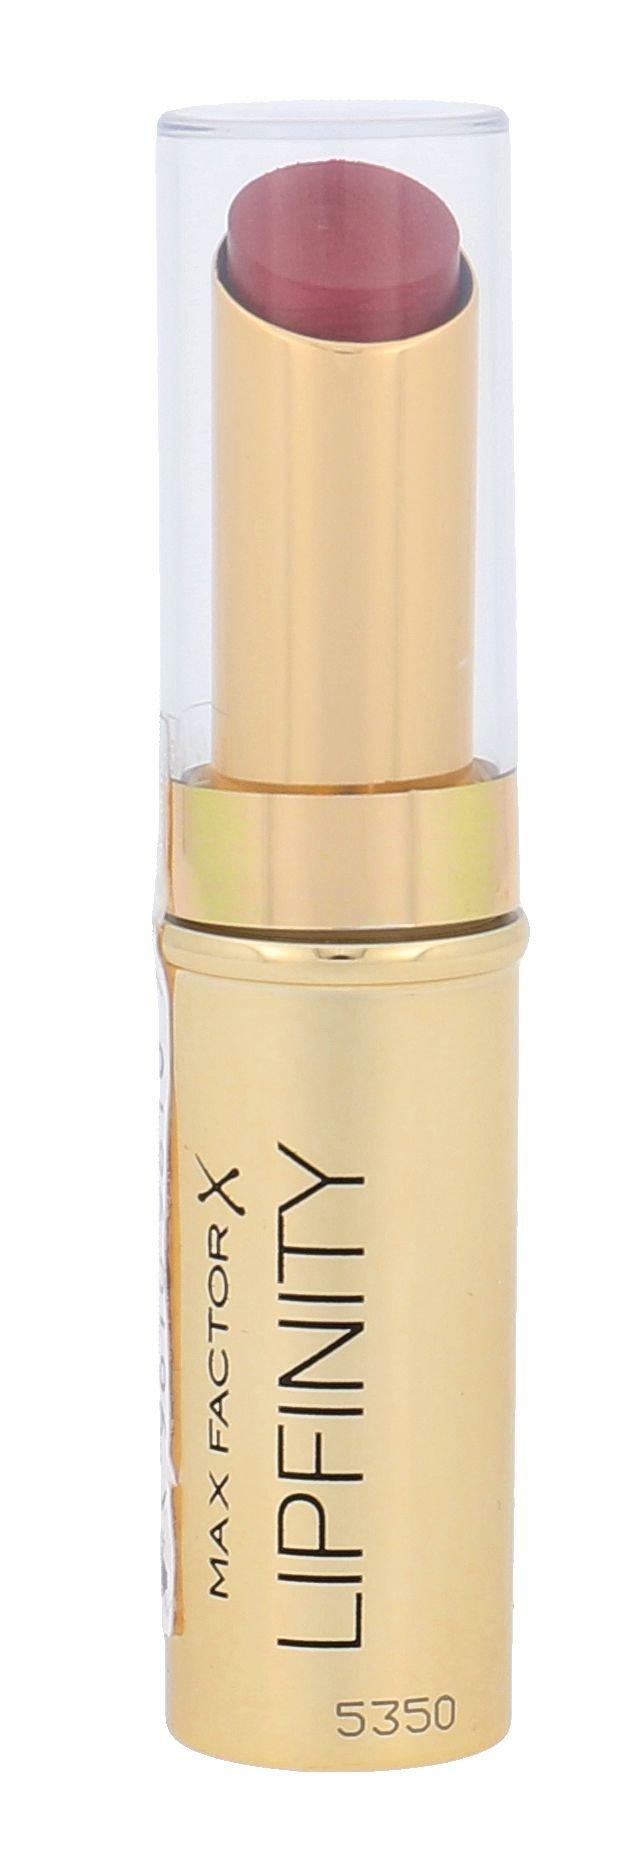 Max Factor Lipfinity Cosmetic 3,4ml 65 So Luxuriant